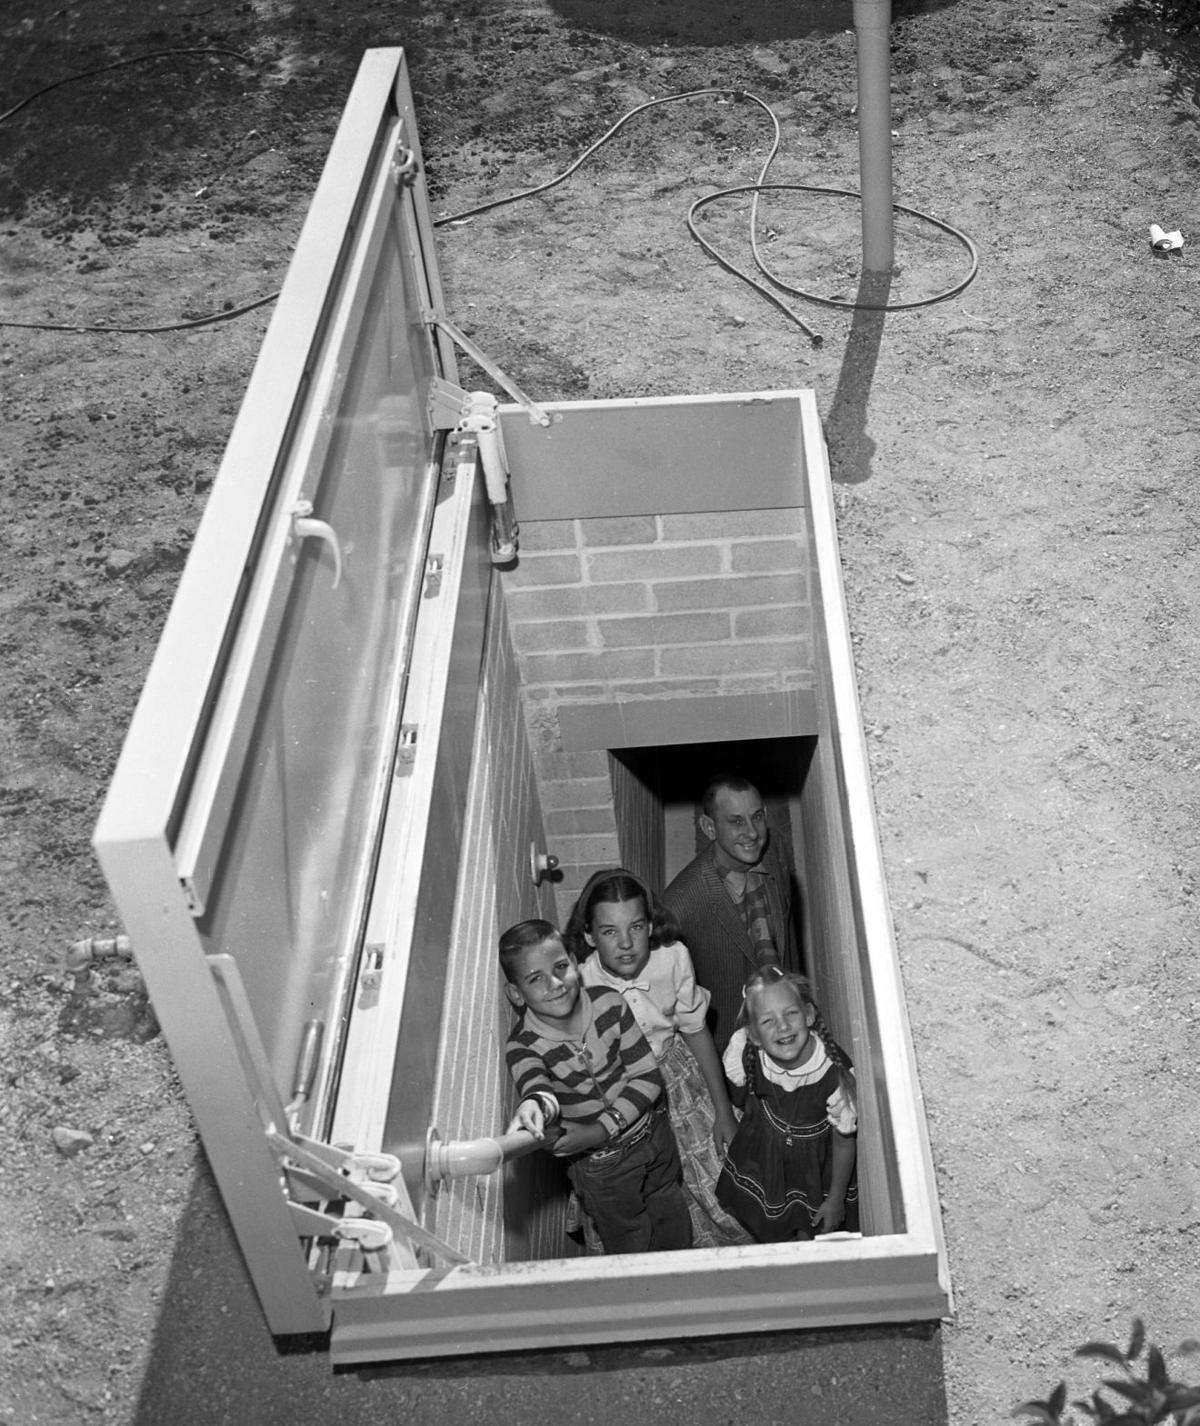 photos tucson u0027s fallout shelters galleries tucson com